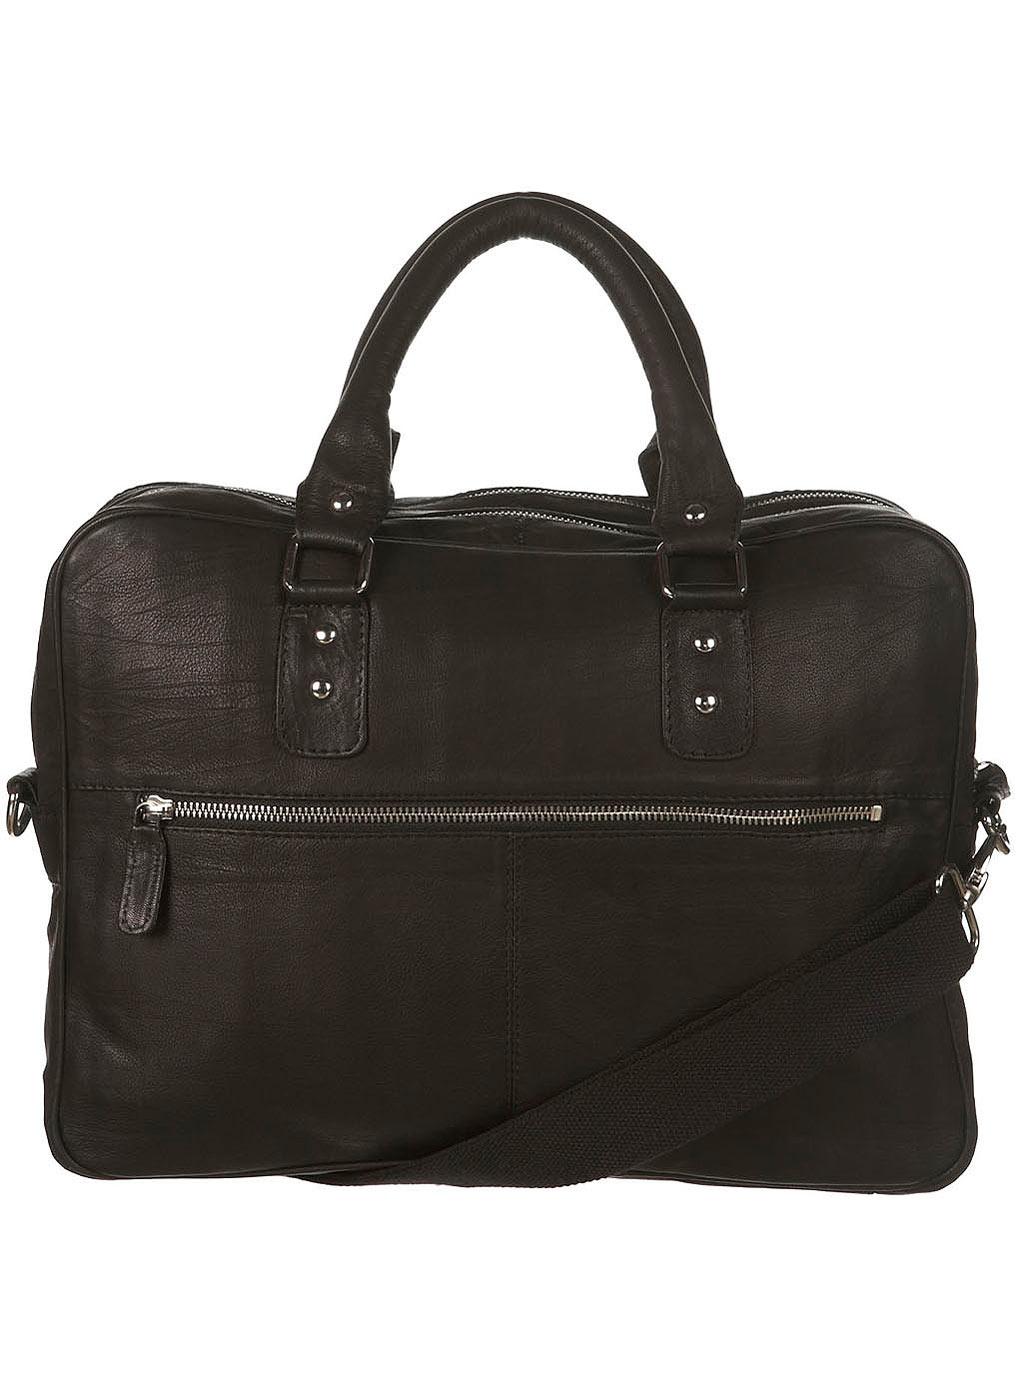 Topman Black Leather Laptop Bag In Black For Men Lyst